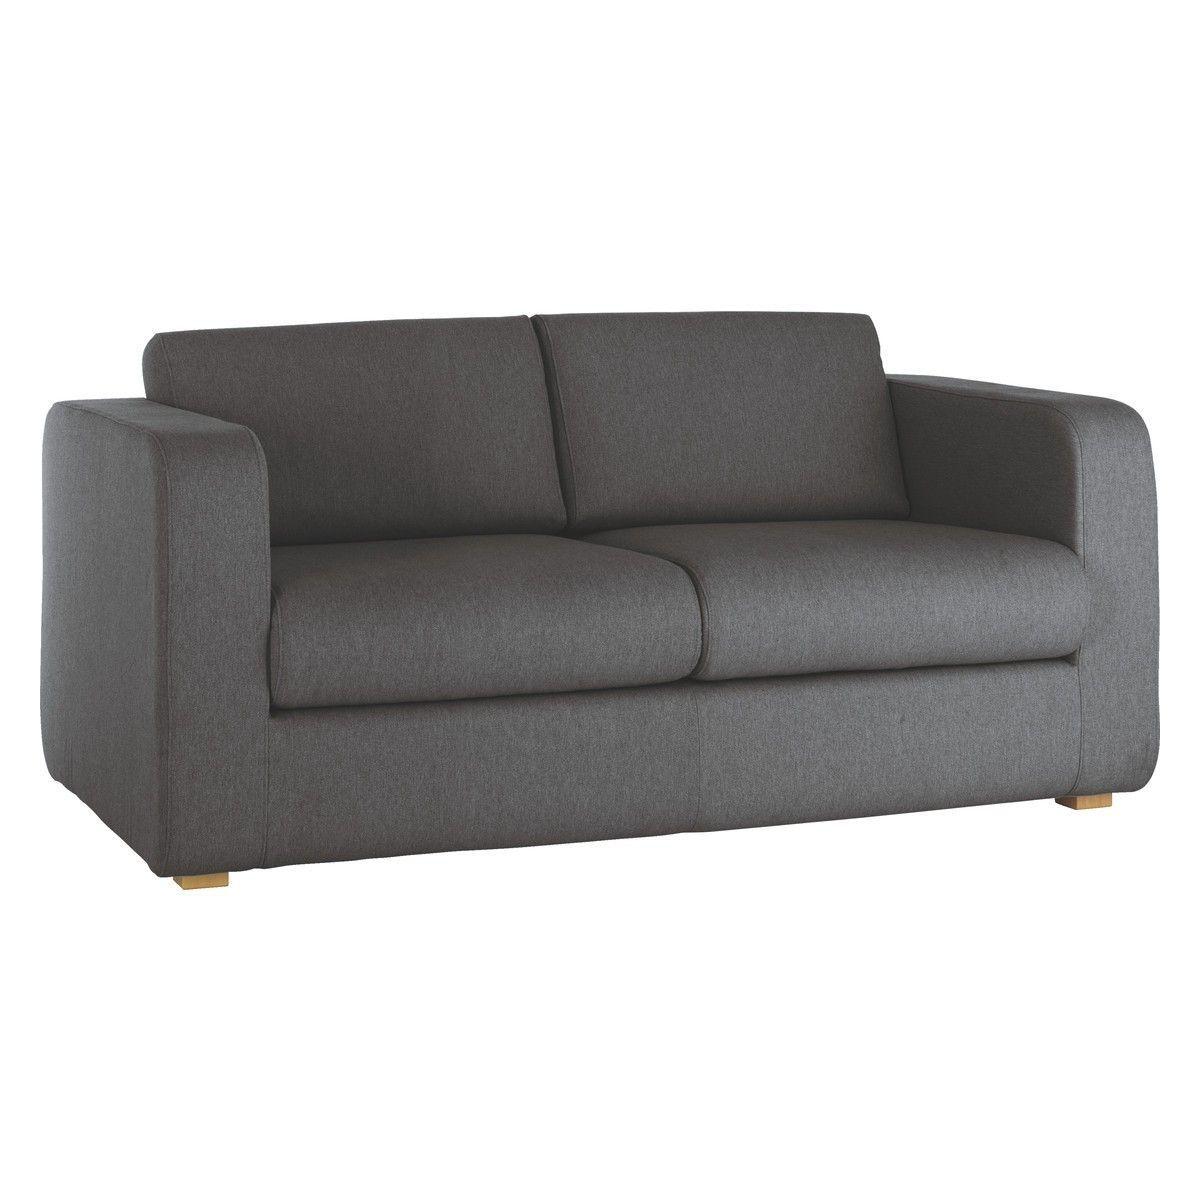 Porto Charcoal Fabric 2 Seater Sofa Bed Charcoal Fabric Porto Seater Diy Sofa Bed 2 Seater Sofa Seater Sofa